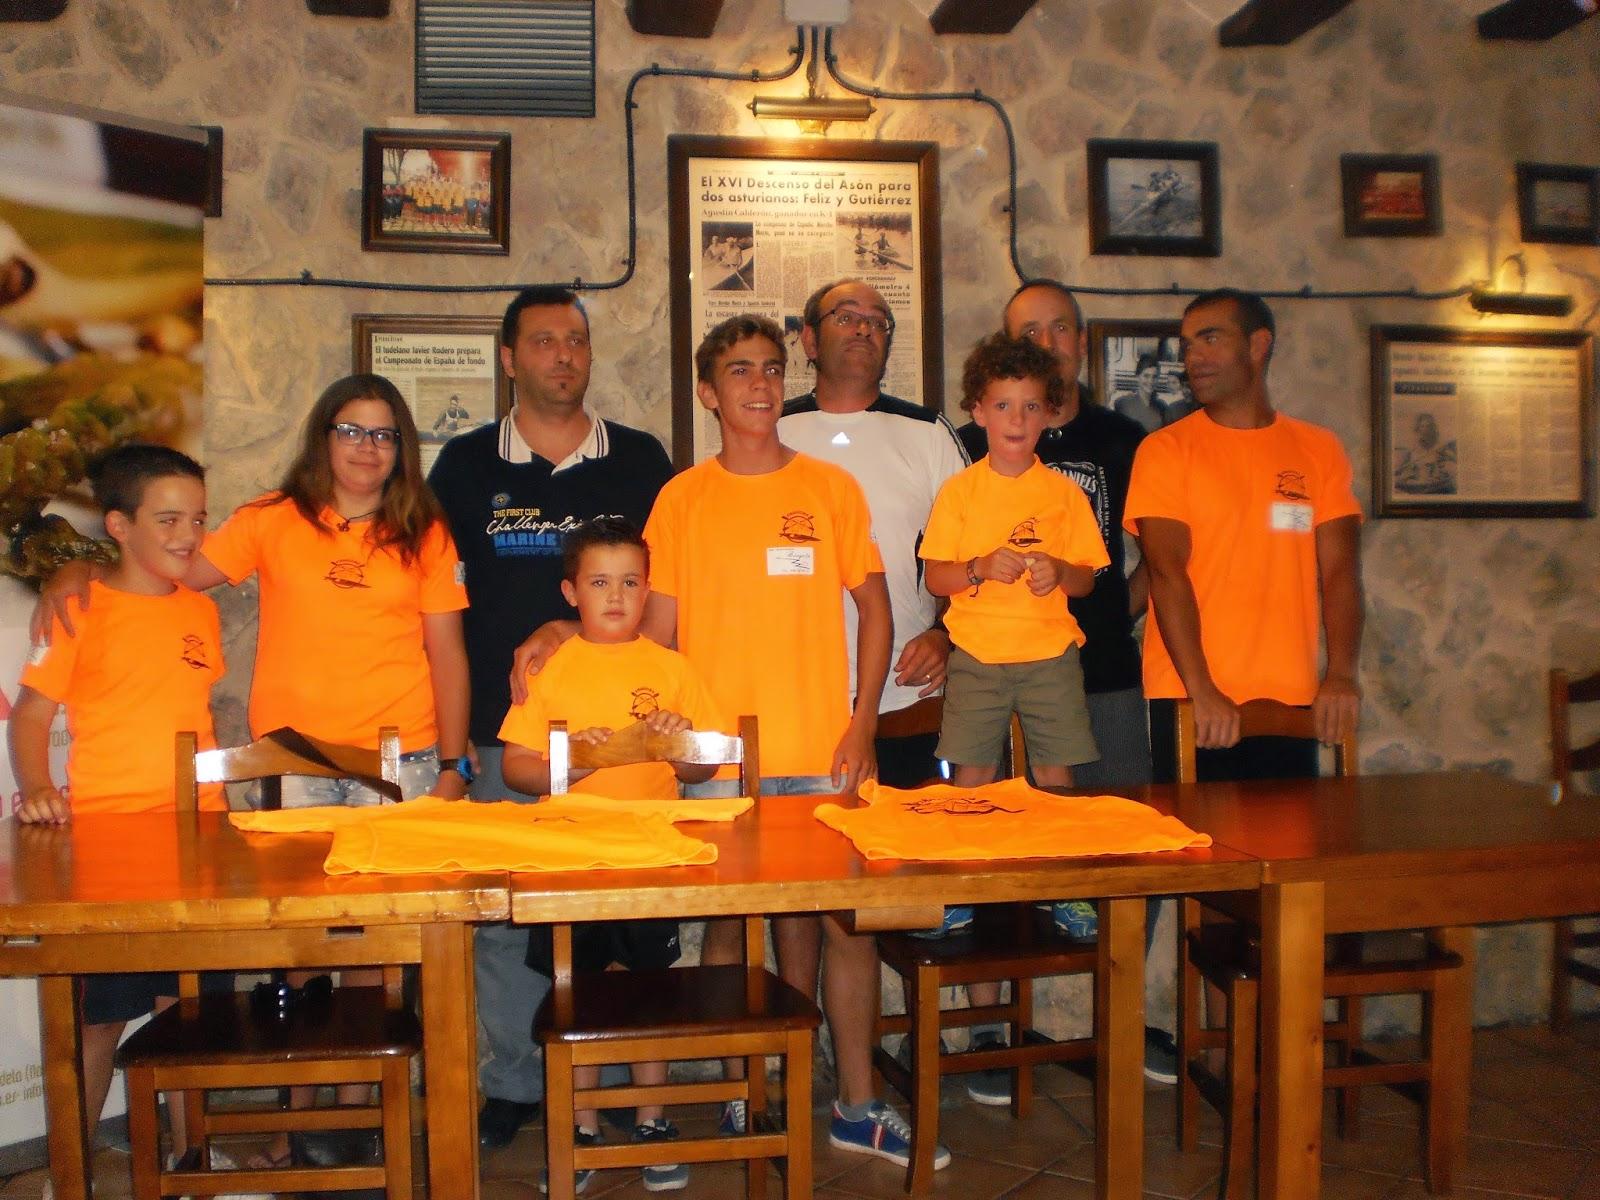 Club piraguismo team marmol tudela 2014 07 13 - Casa lola tudela ...